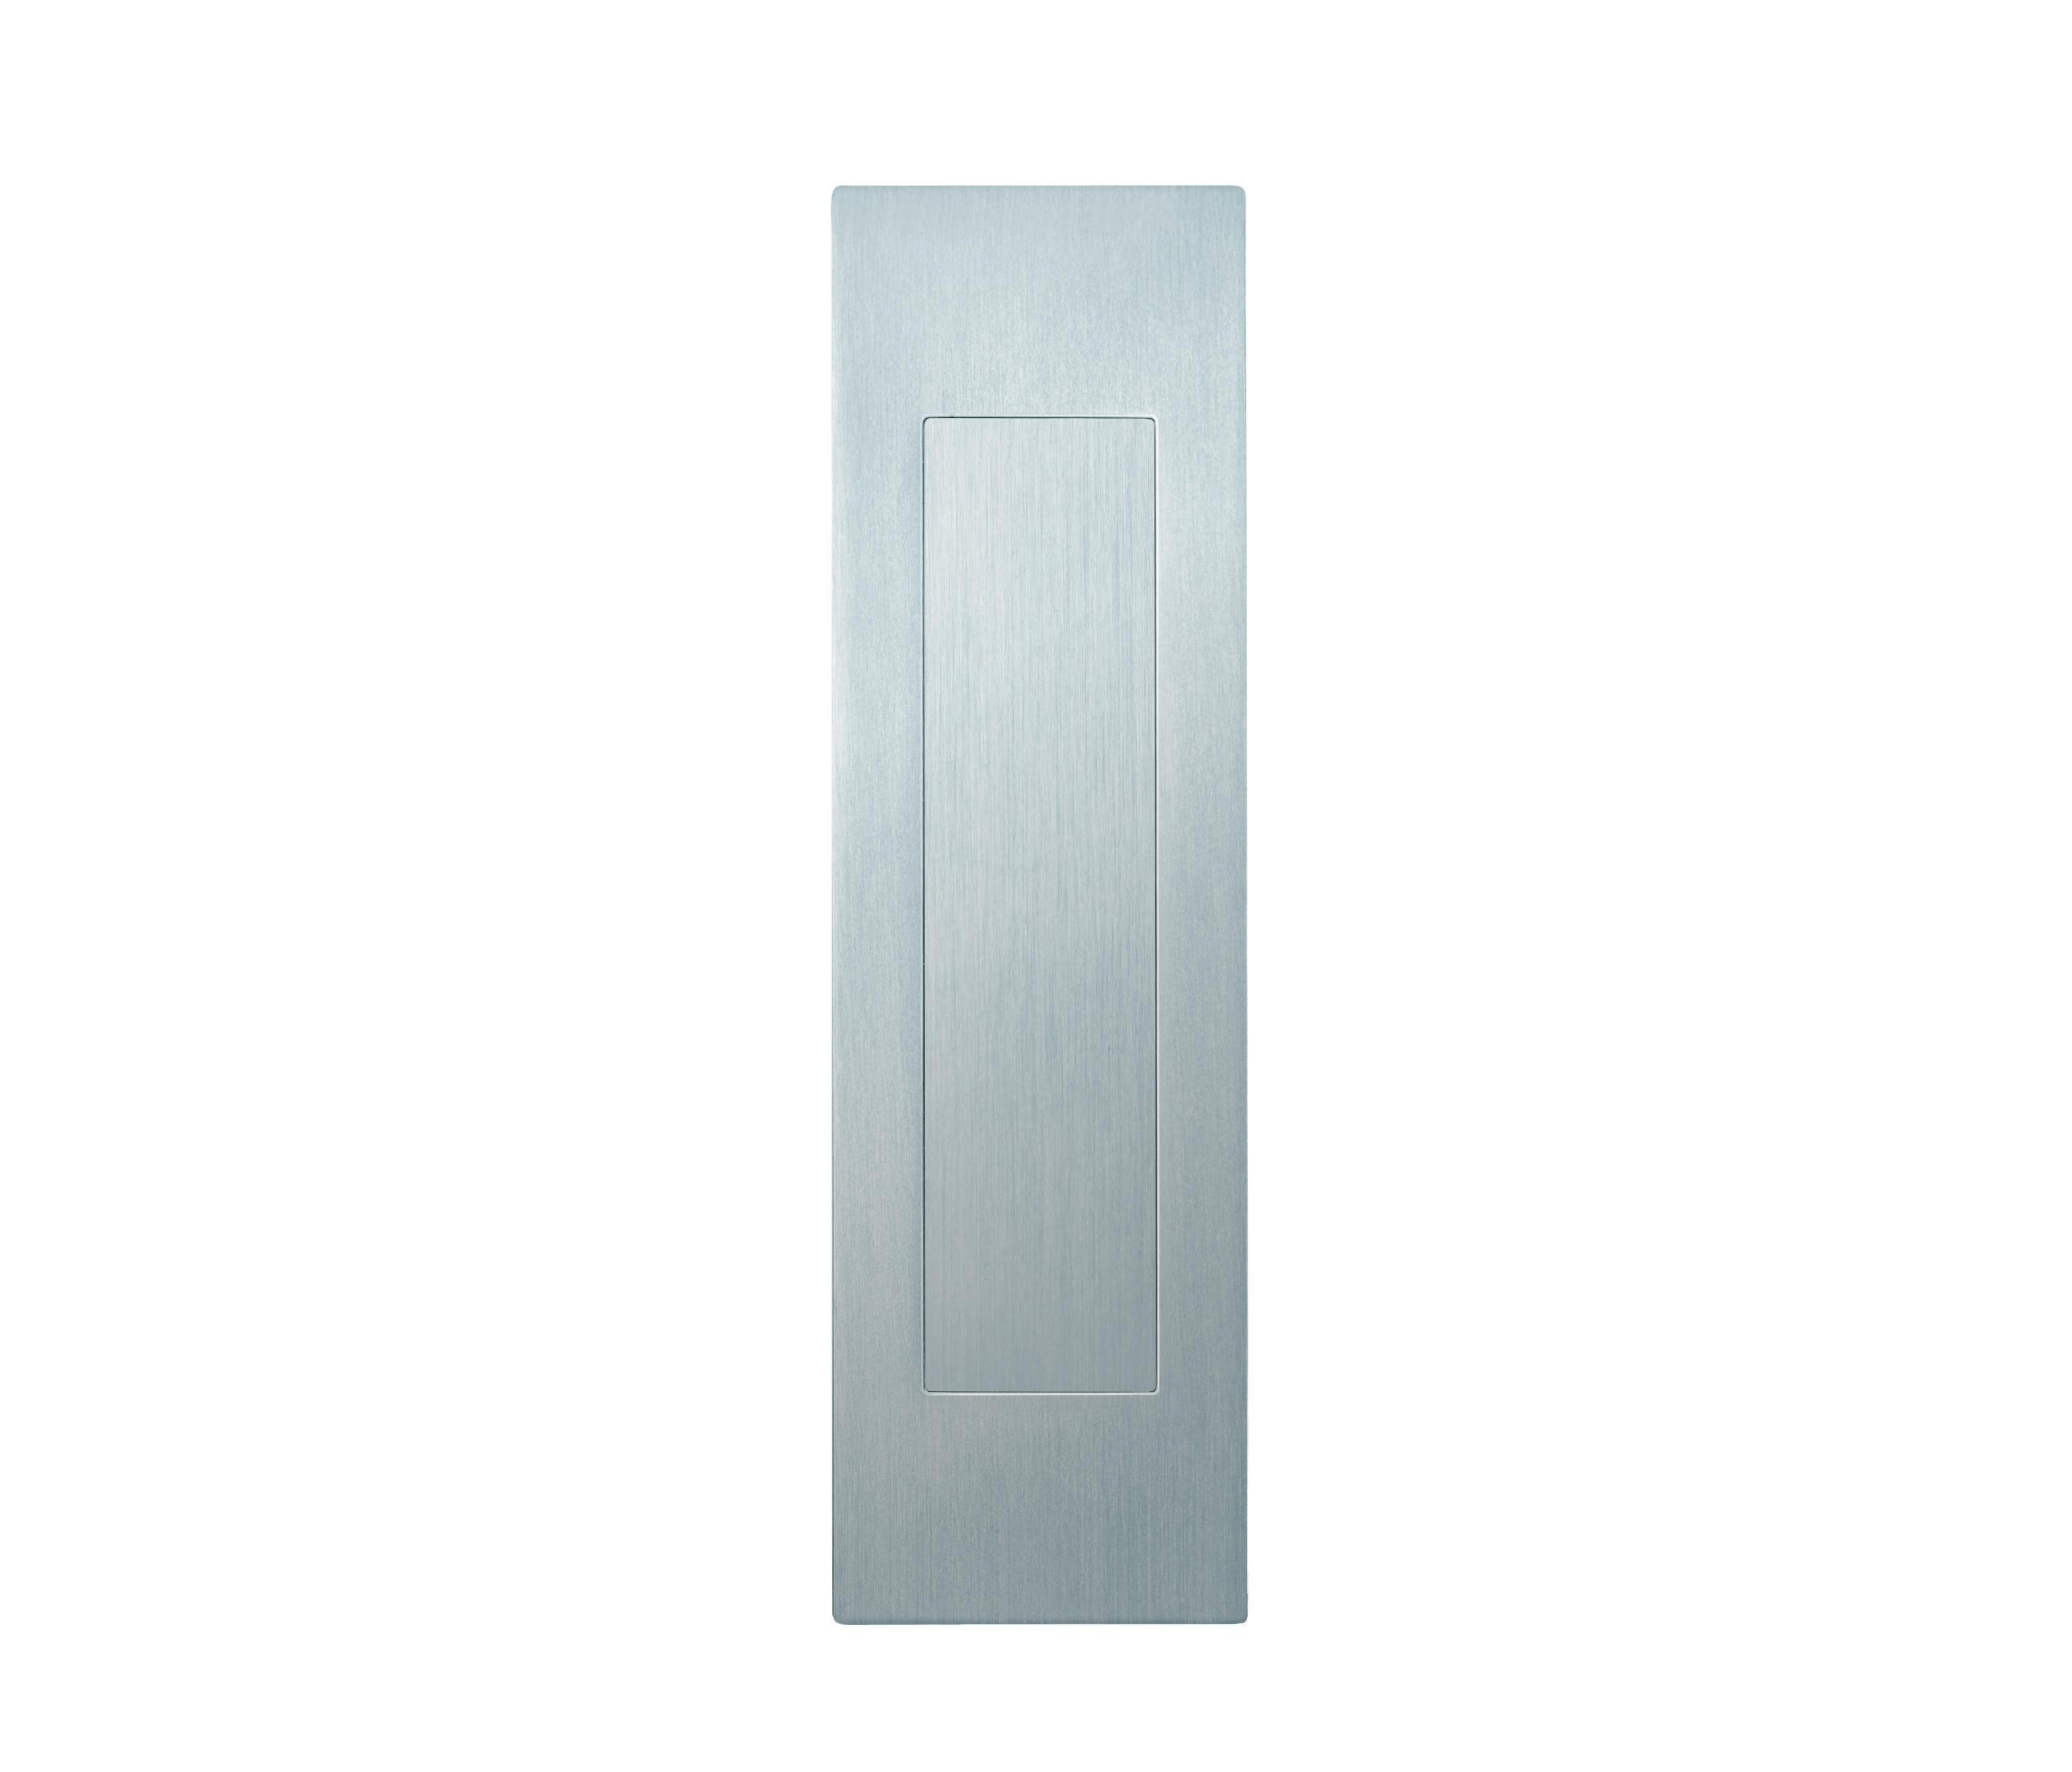 fsb 42 4251 flush pulls flush pull handles from fsb. Black Bedroom Furniture Sets. Home Design Ideas